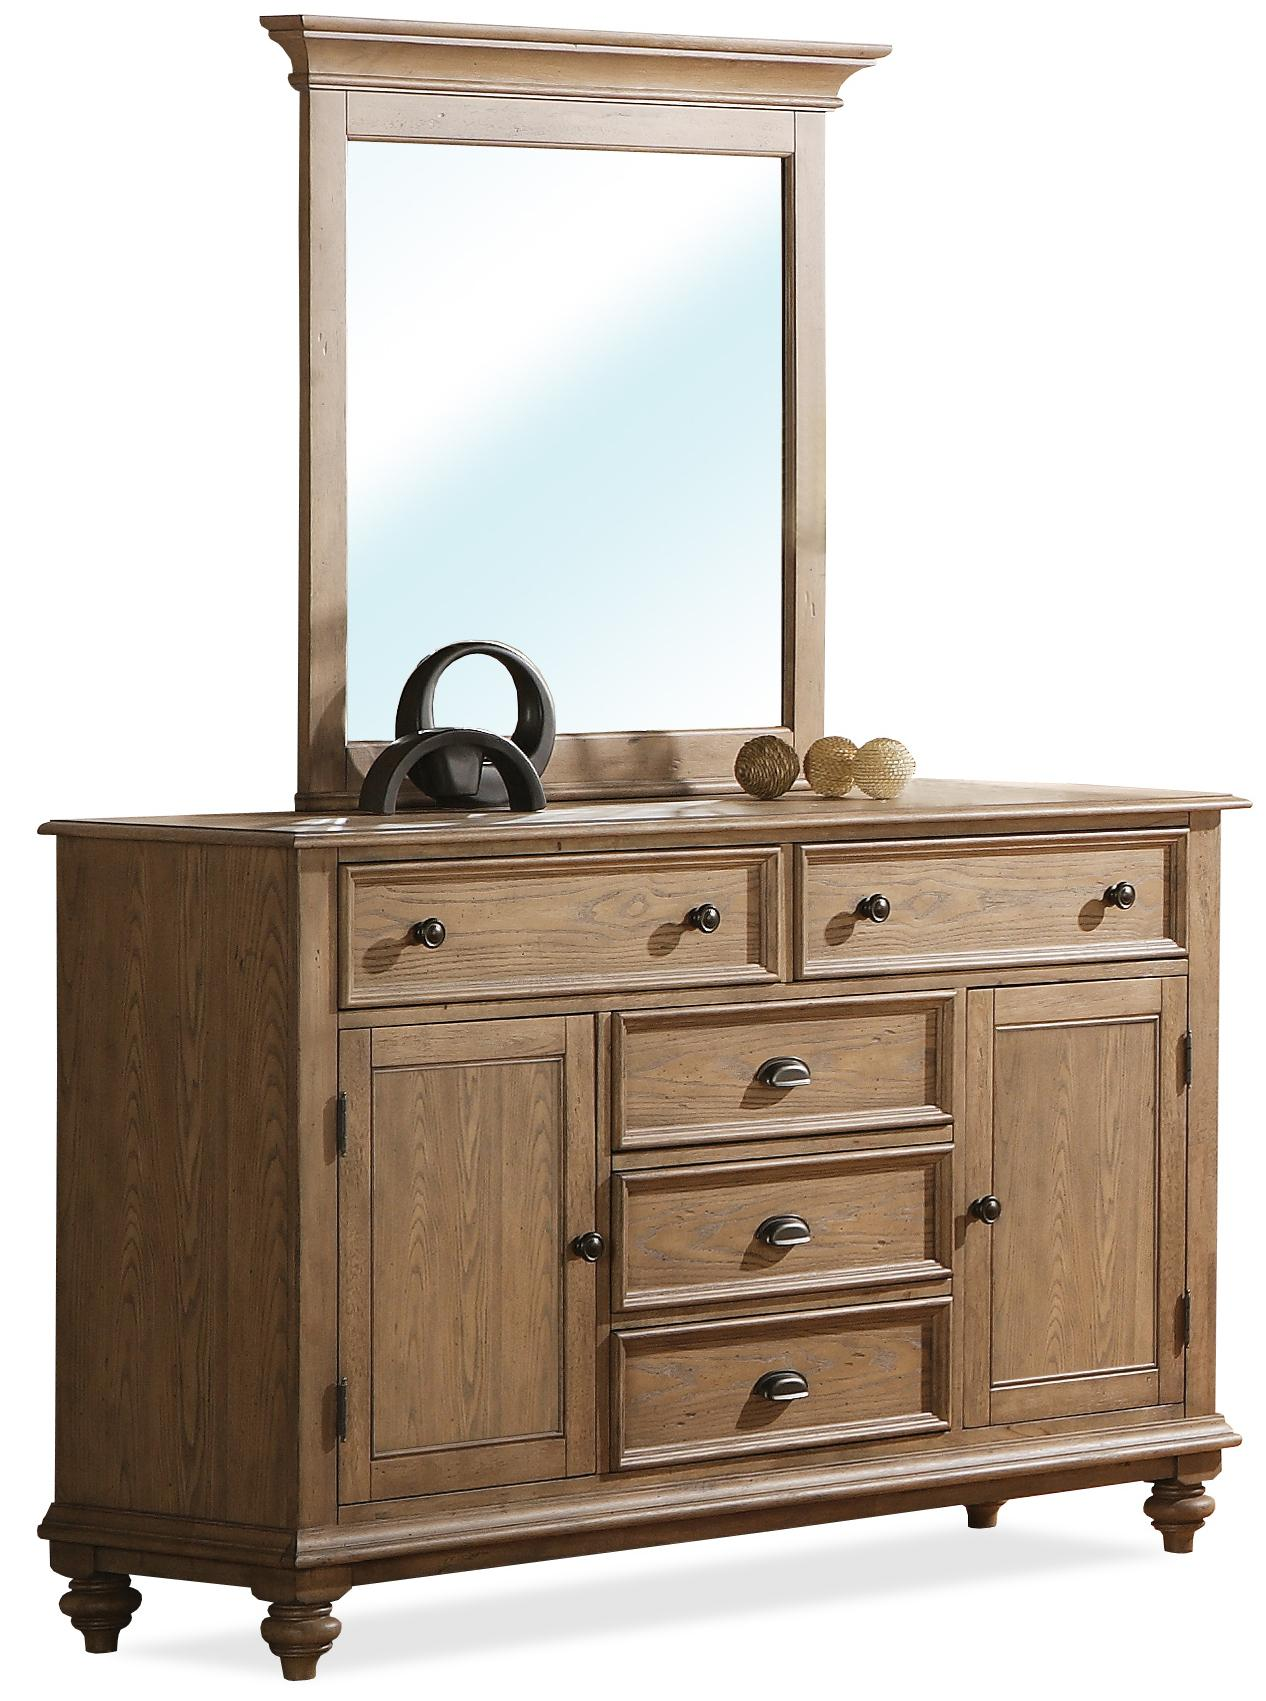 Riverside furniture coventry panel door dresser mirror for Hudsons furniture